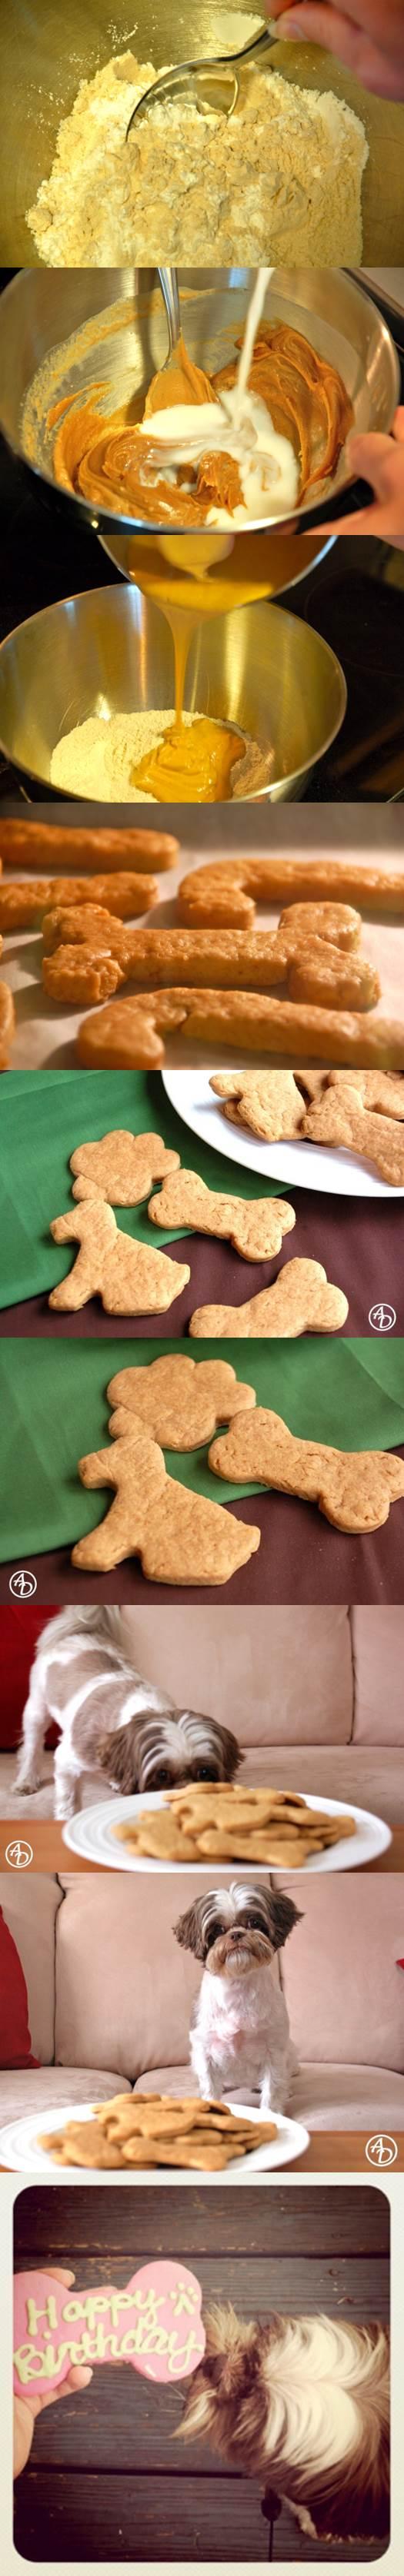 DIY Doggie Approved Peanut Butter Treats 2